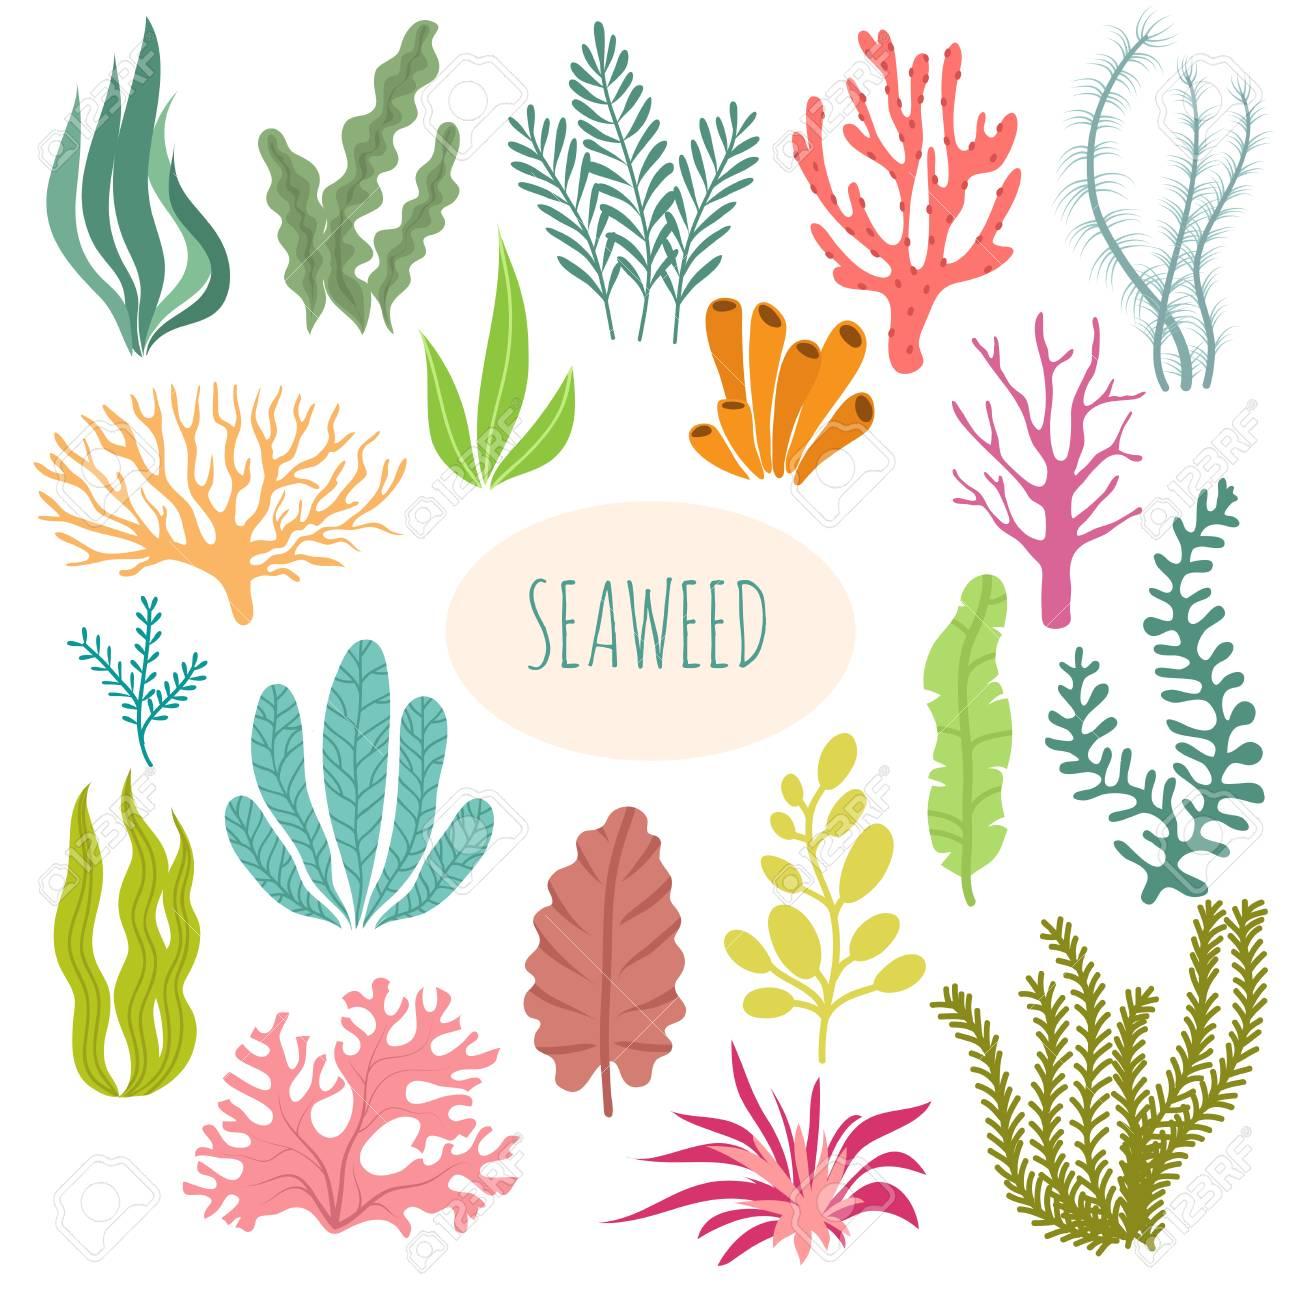 hight resolution of seaweeds aquarium plants underwater planting vector seaweed silhouette isolated set illustration of